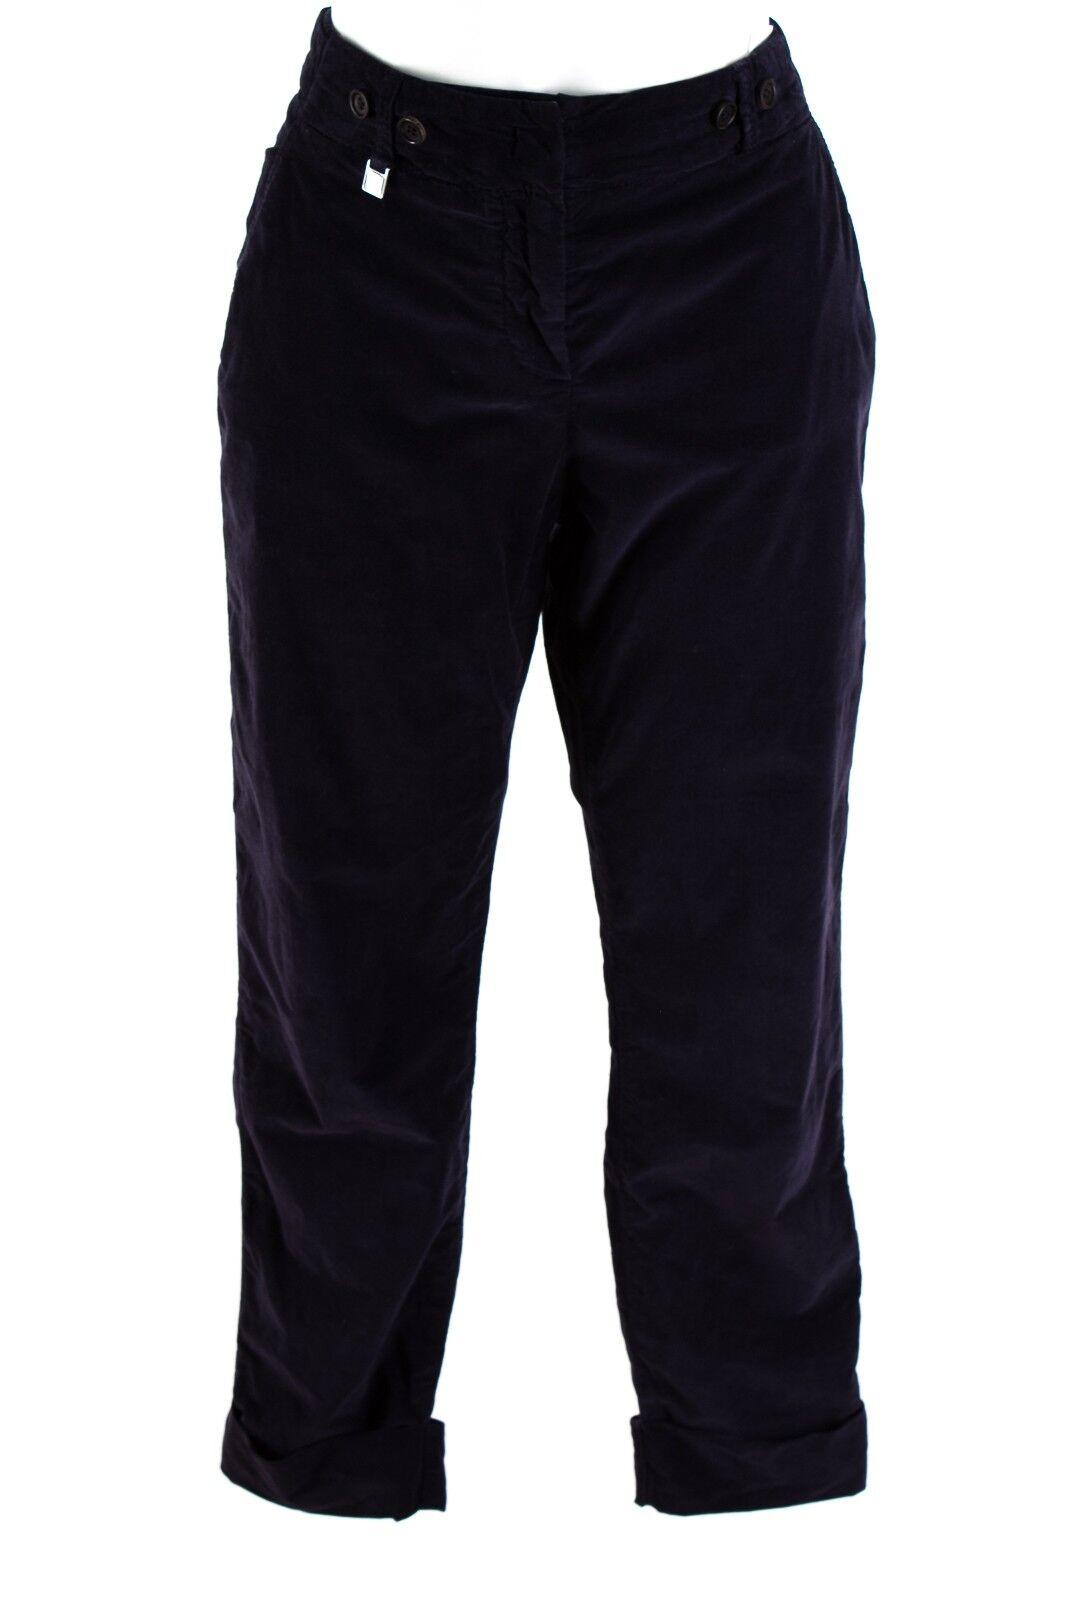 RENE LEZARD Hose Gr. 36 Baumwolle 7 8 Stretchhose Kordhose Casual Cord Pants